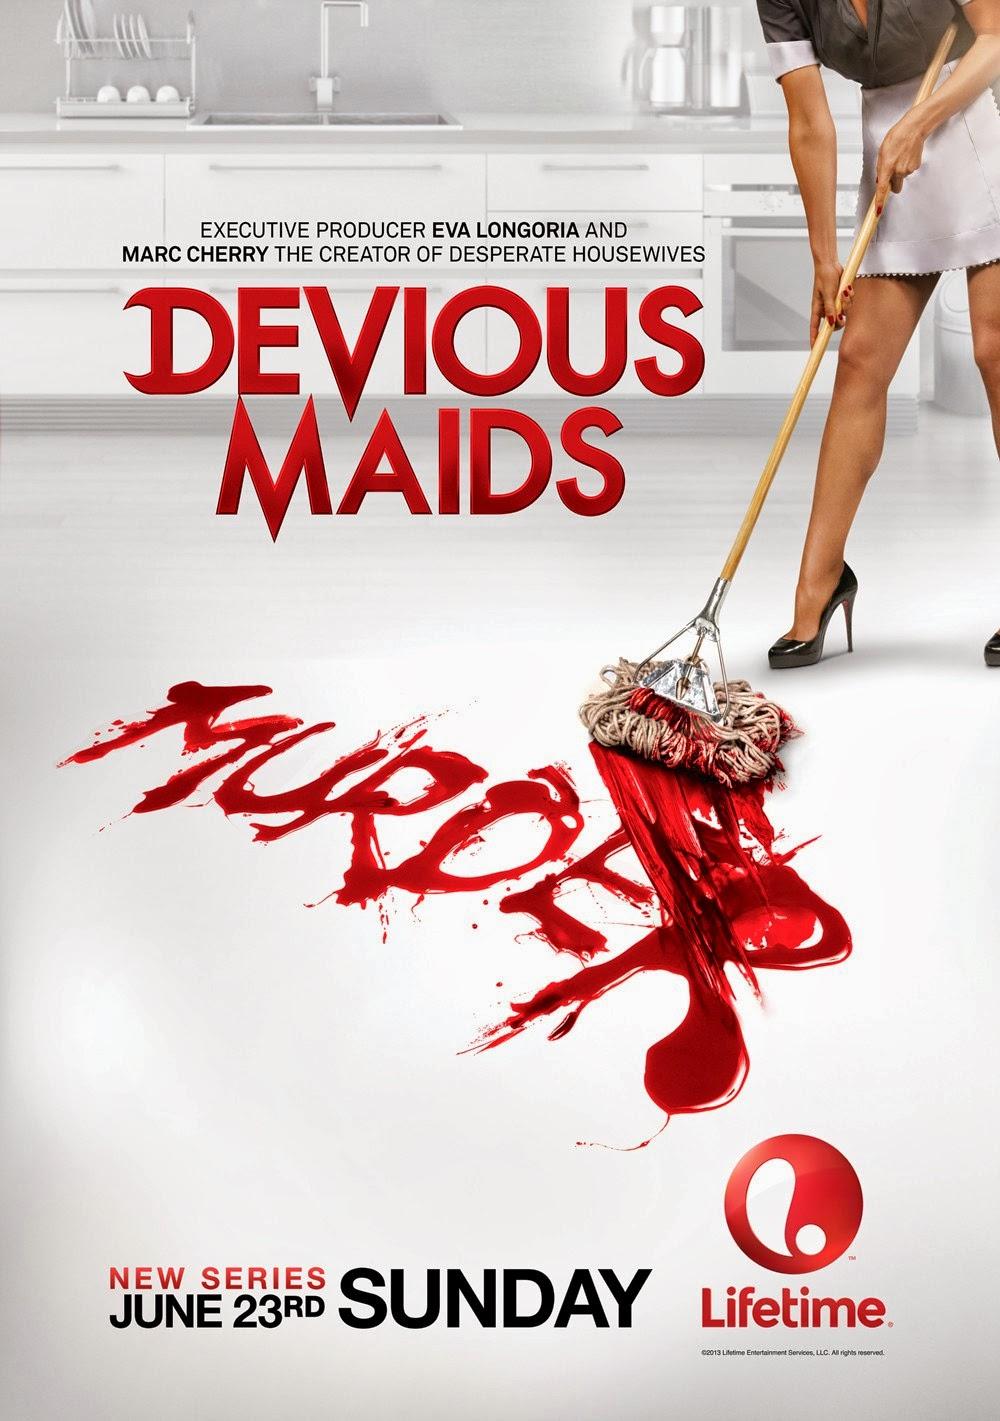 Devious Maids, Devious Maids UK airing, Eva Longoria Devious Maids